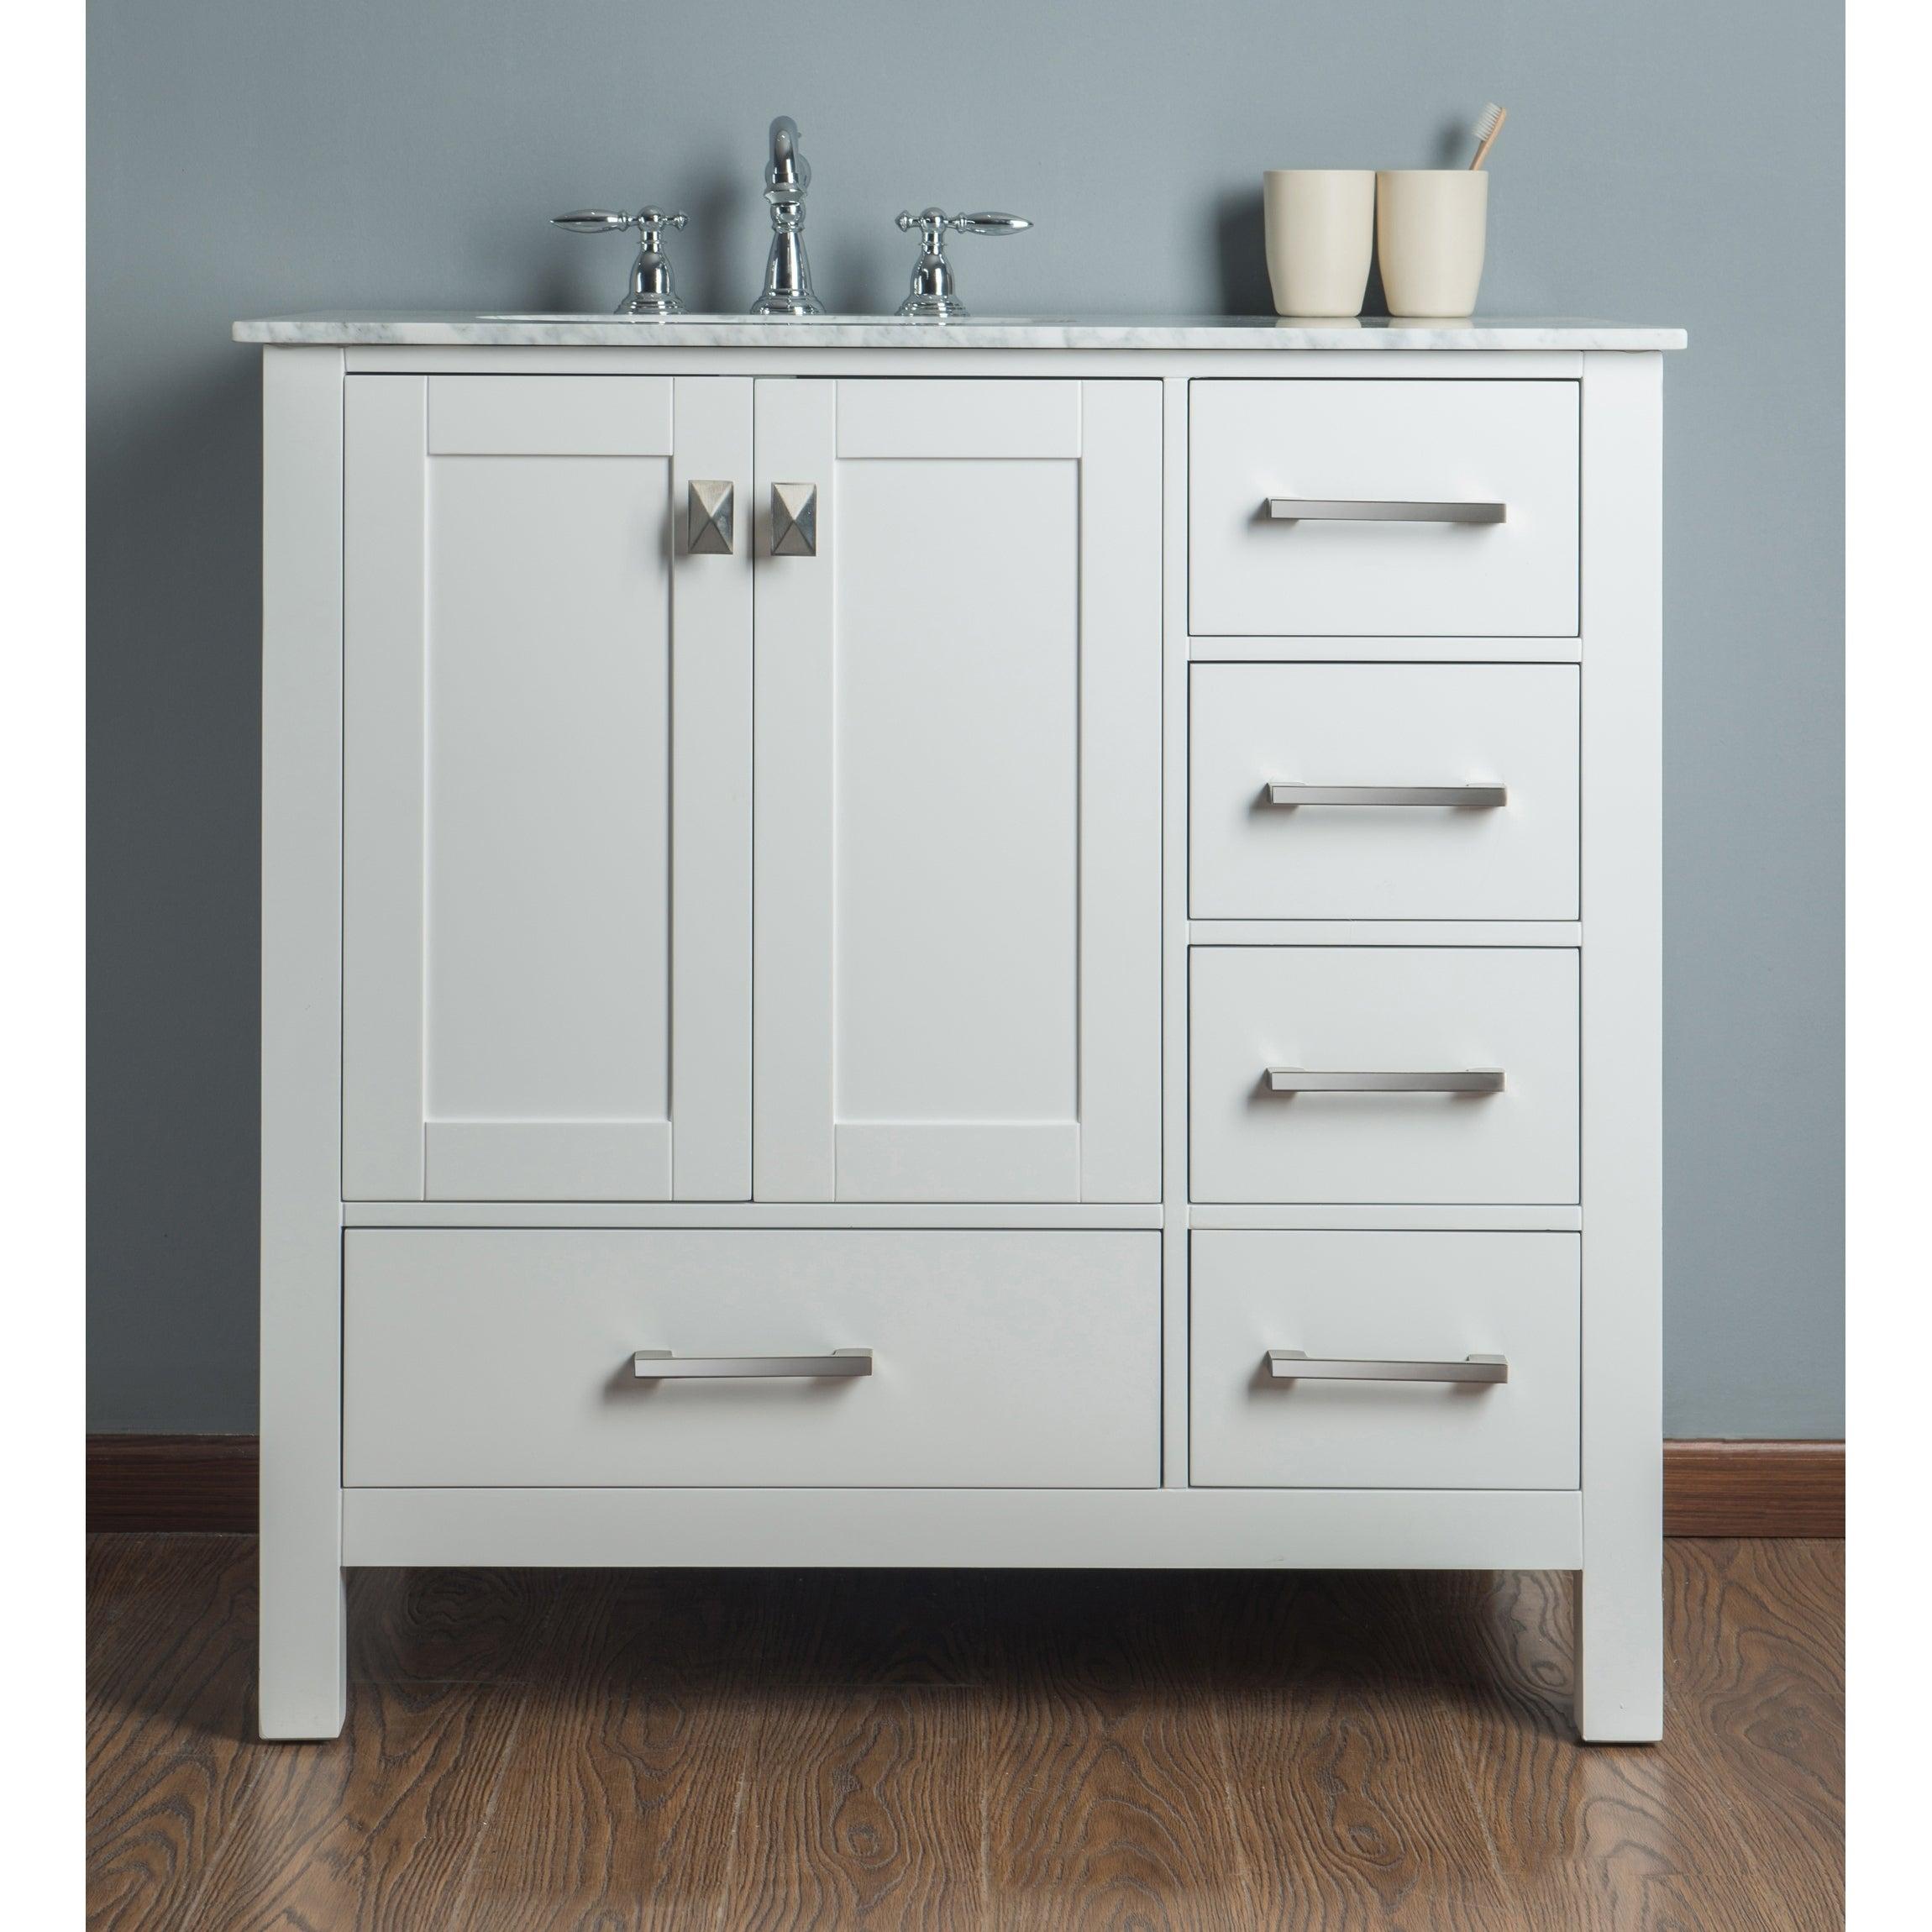 Shop malibu pure white single sink 36 inch bathroom vanity free shipping today overstock com 9242685